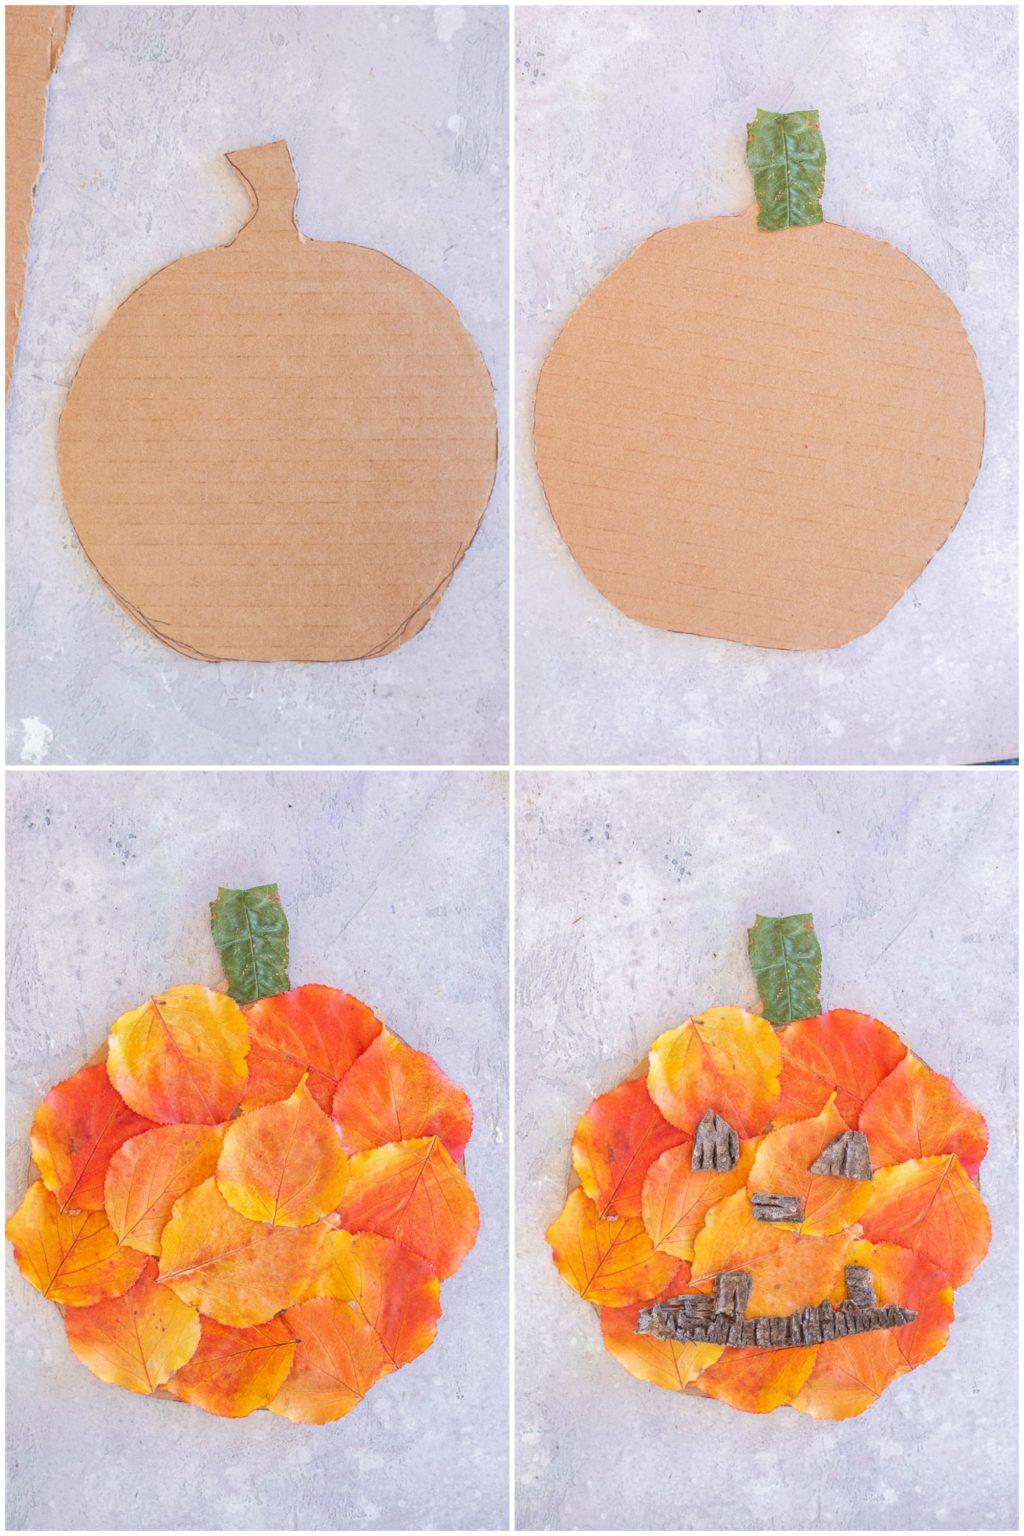 cutout cardboard pumpkins with fall leaves glued on them